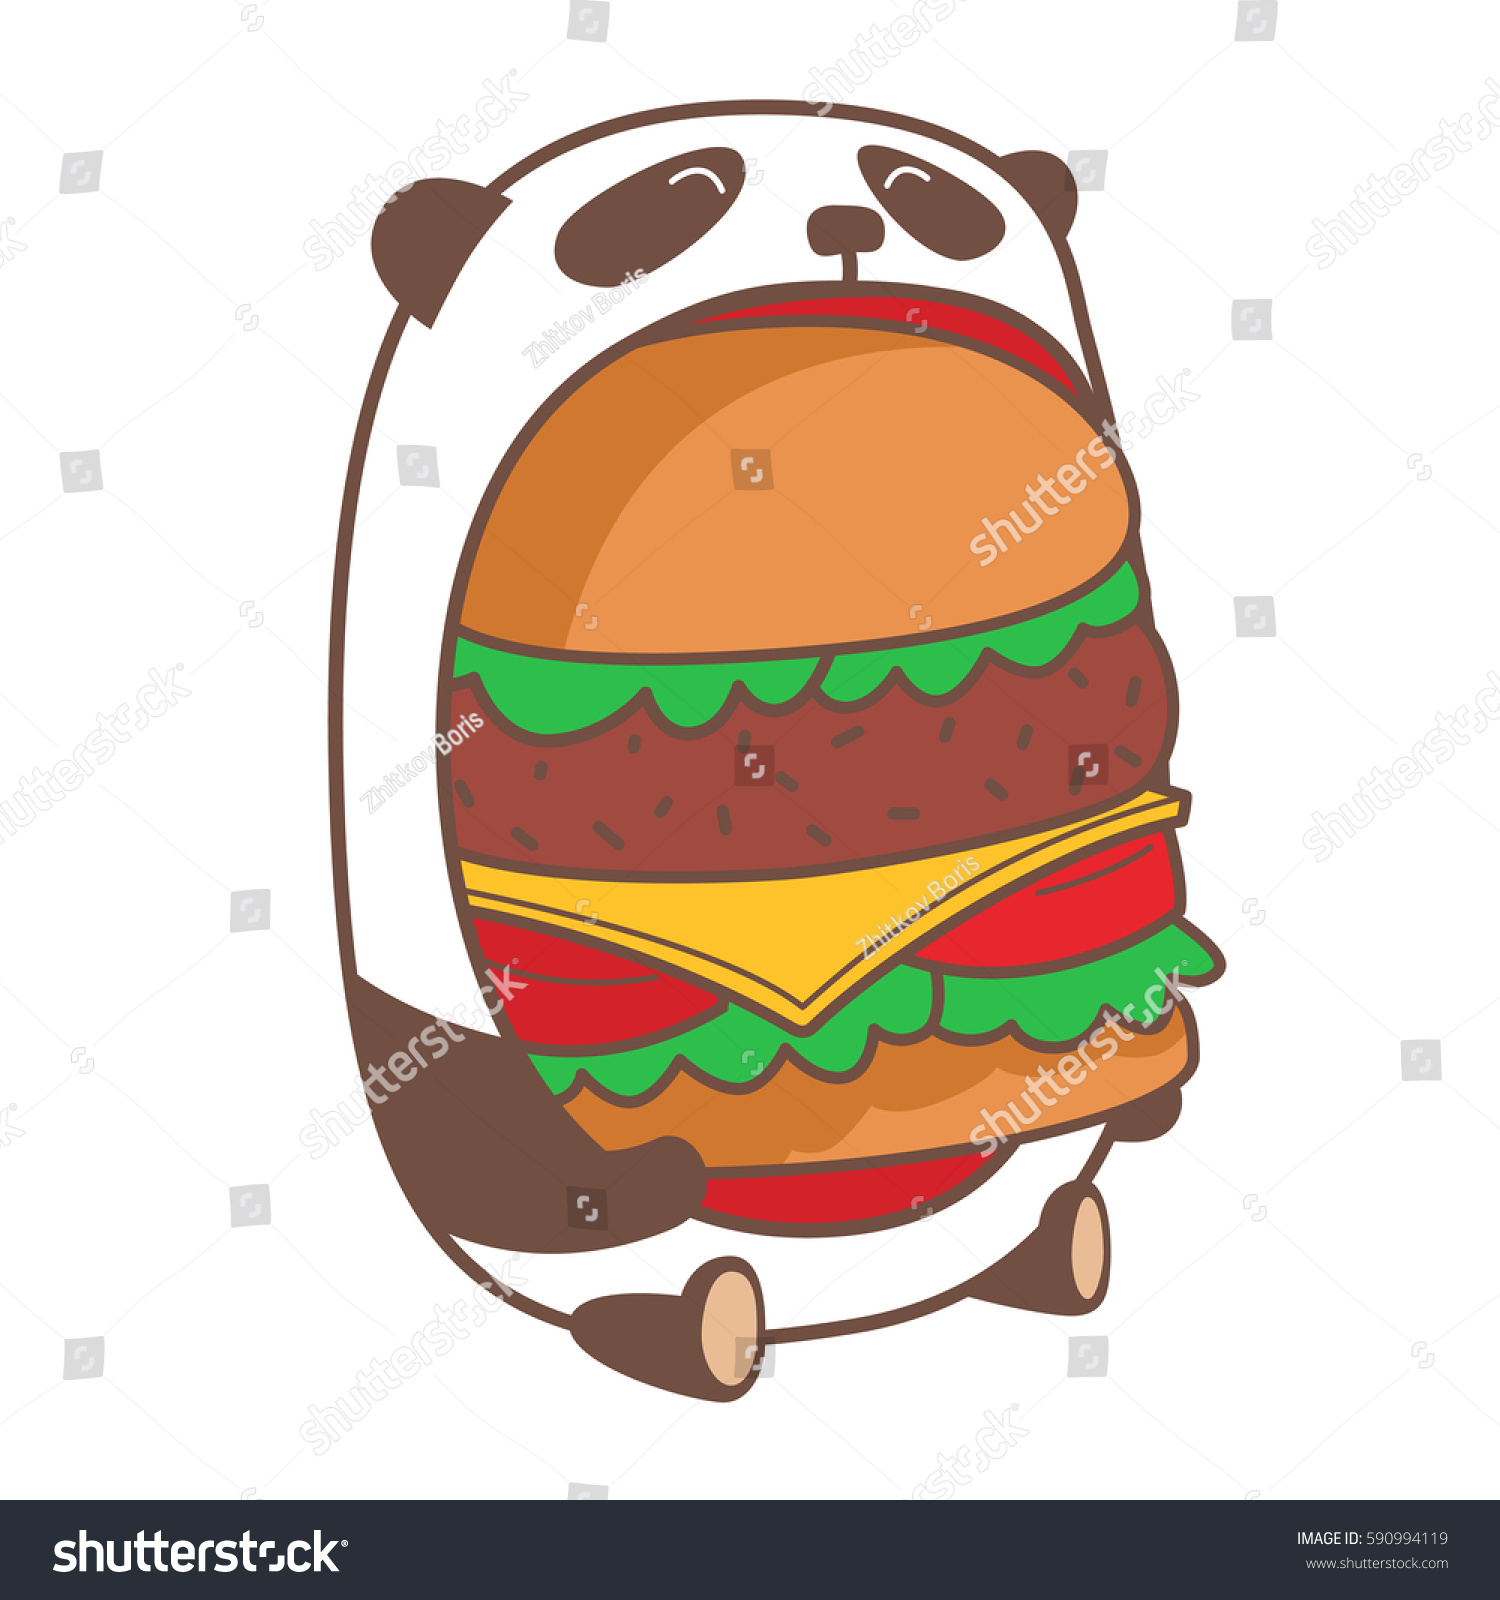 hamburger cartoon character